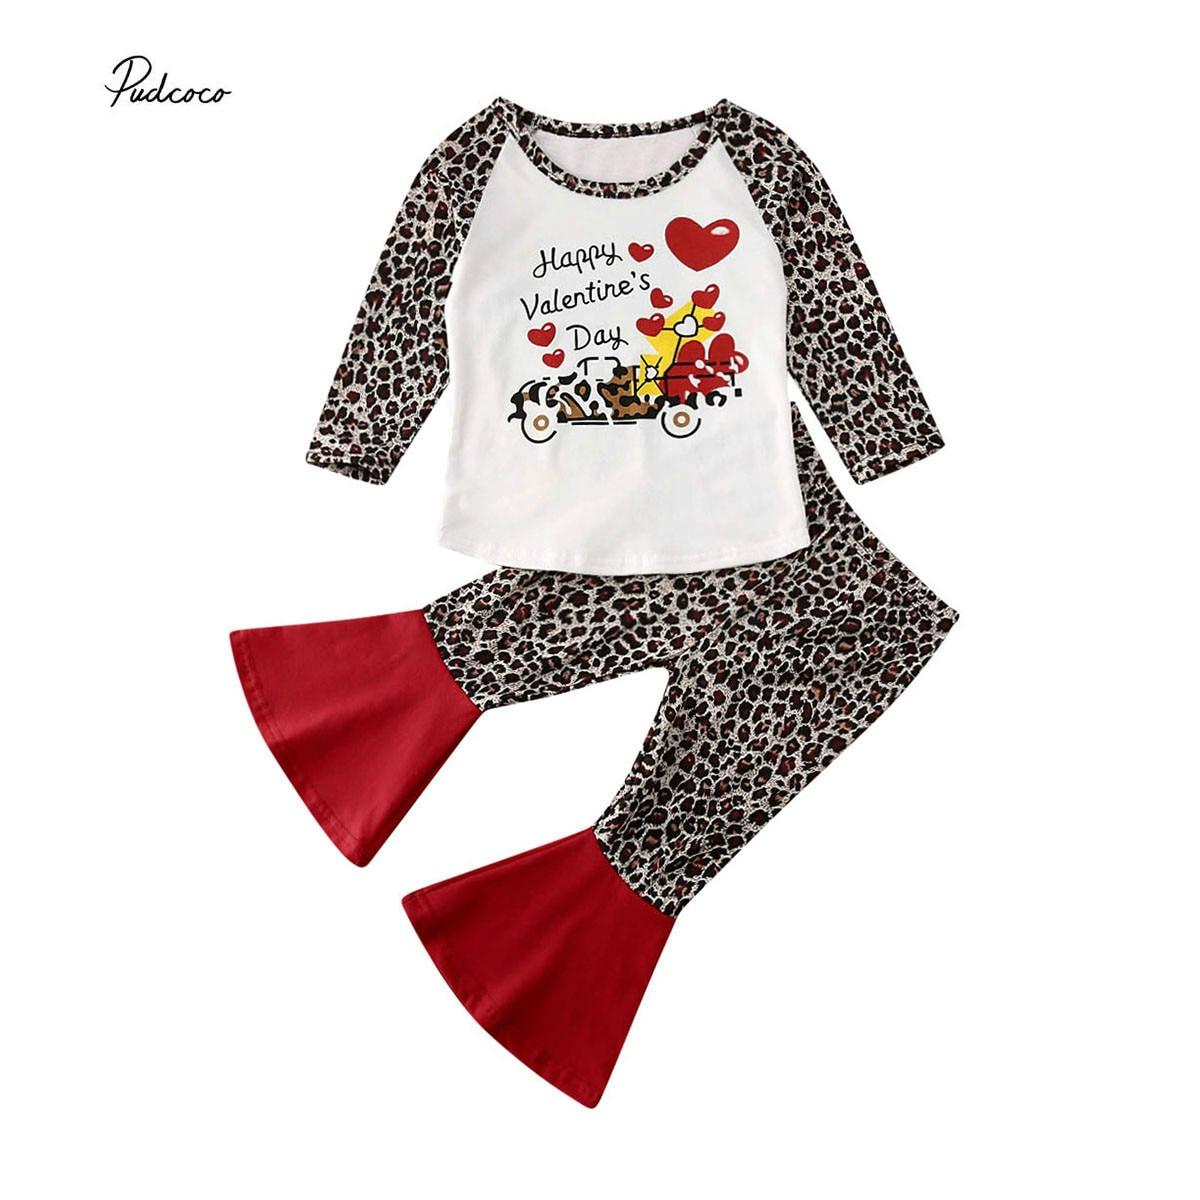 Newborn Toddler Baby Girl Tops T shirt Leopard Pants Headband Outfit Clothes Set